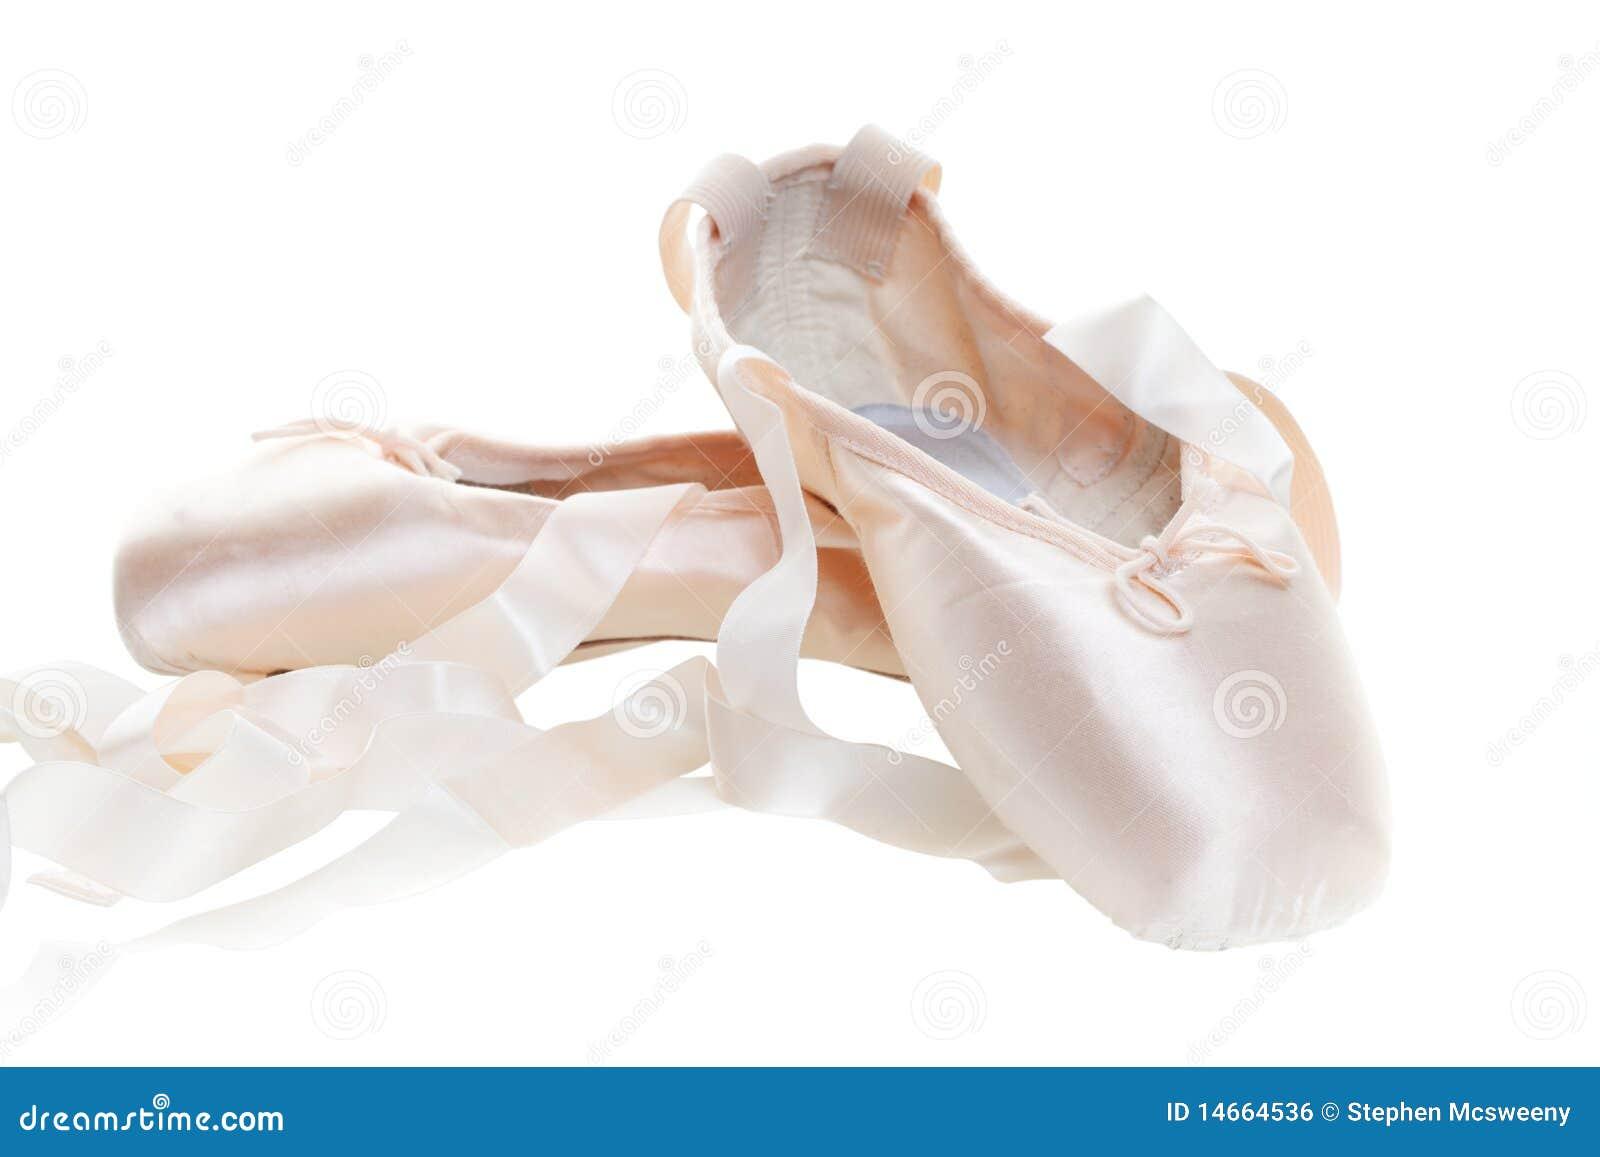 White Ballerina Ribbon Shoes